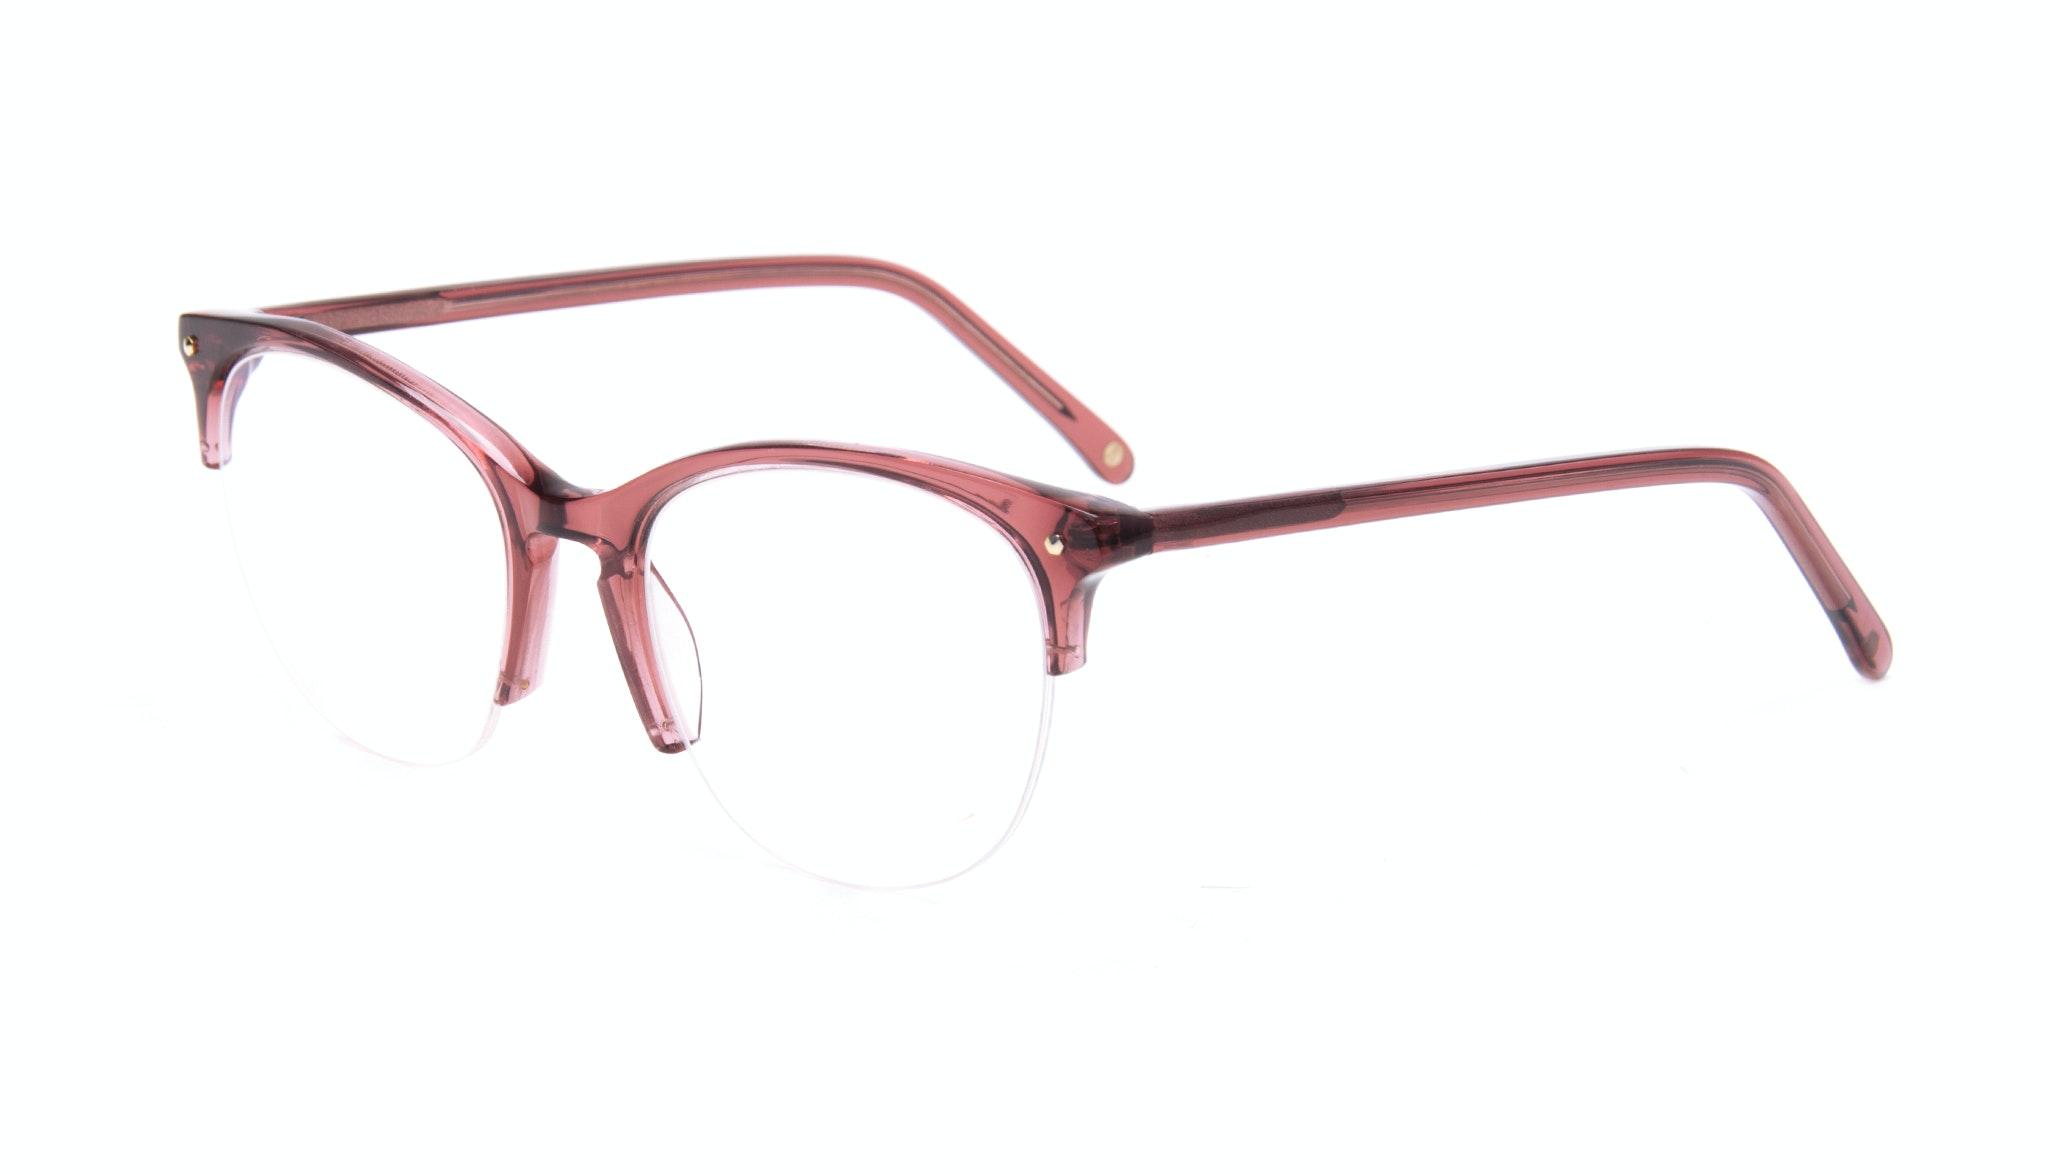 Affordable Fashion Glasses Rectangle Square Round Semi-Rimless Eyeglasses Women Nadine Light Winegum Tilt